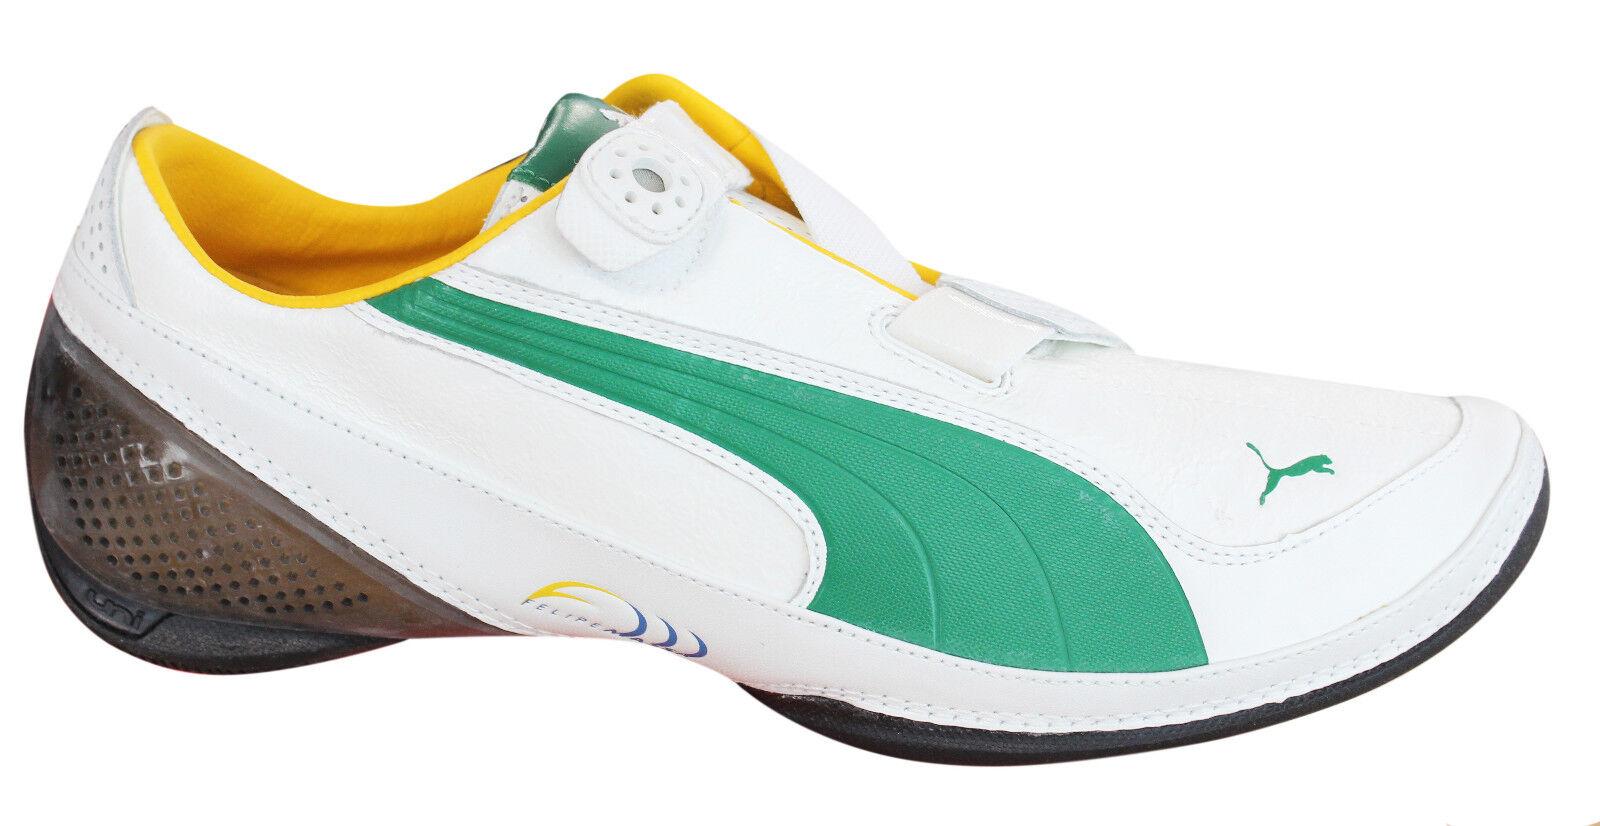 0726ac7c4b84 Puma Puma Puma Furio V Massa Mens Trainers Hook   Loop Strap Shoes White  302073 02